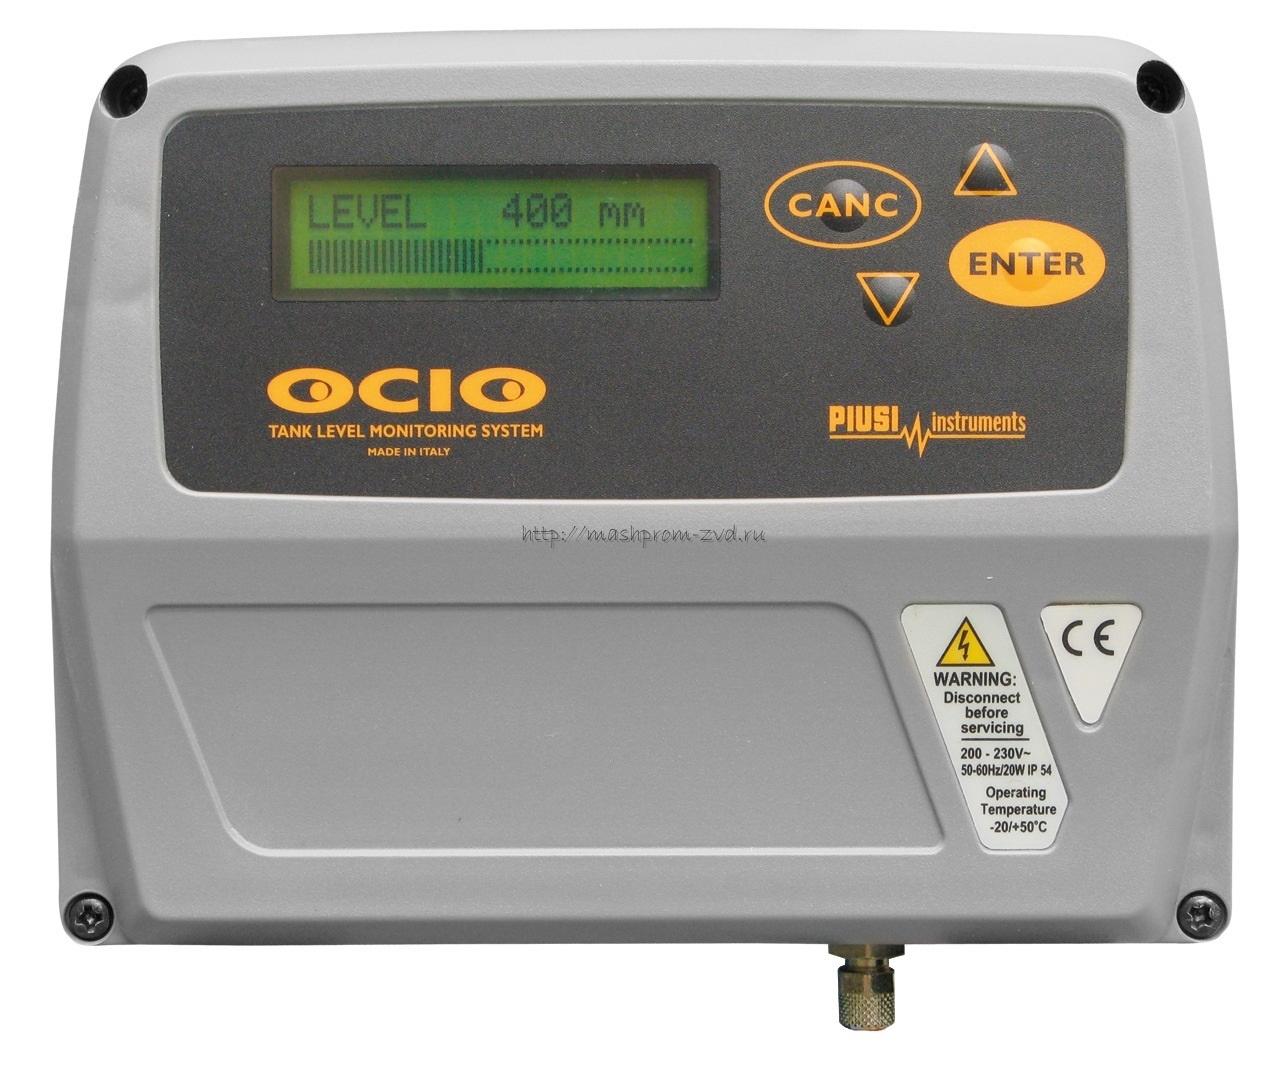 Ocio арт. F0075510D - система контроля уровня топлива в резервуаре